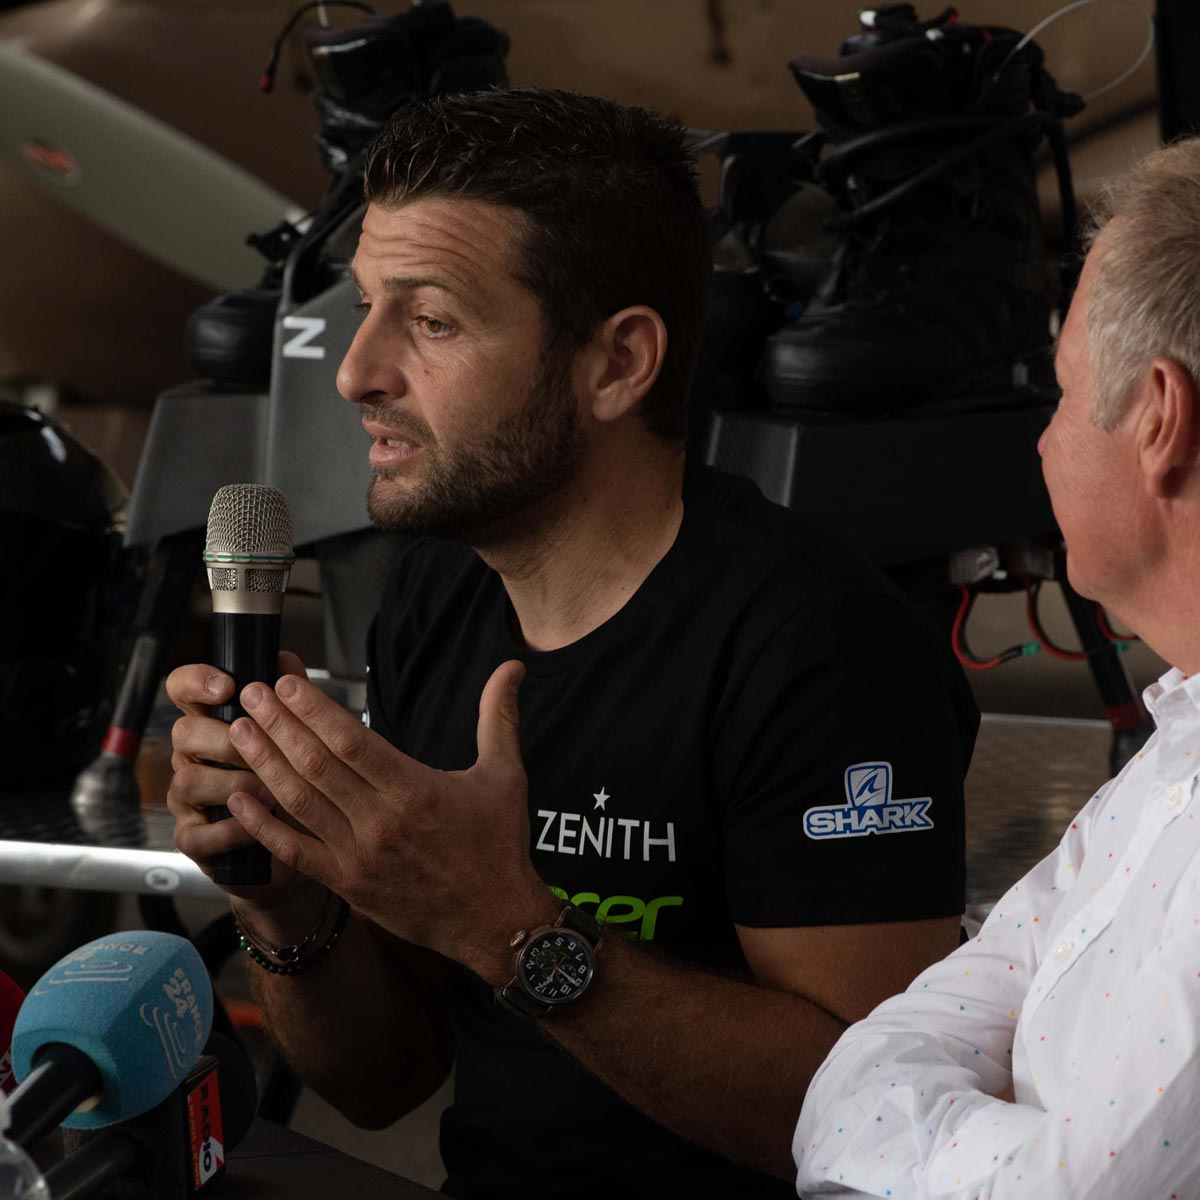 La Cote des Montres : Photo - ZENITH accueille le pionnier volant Franky Zapata